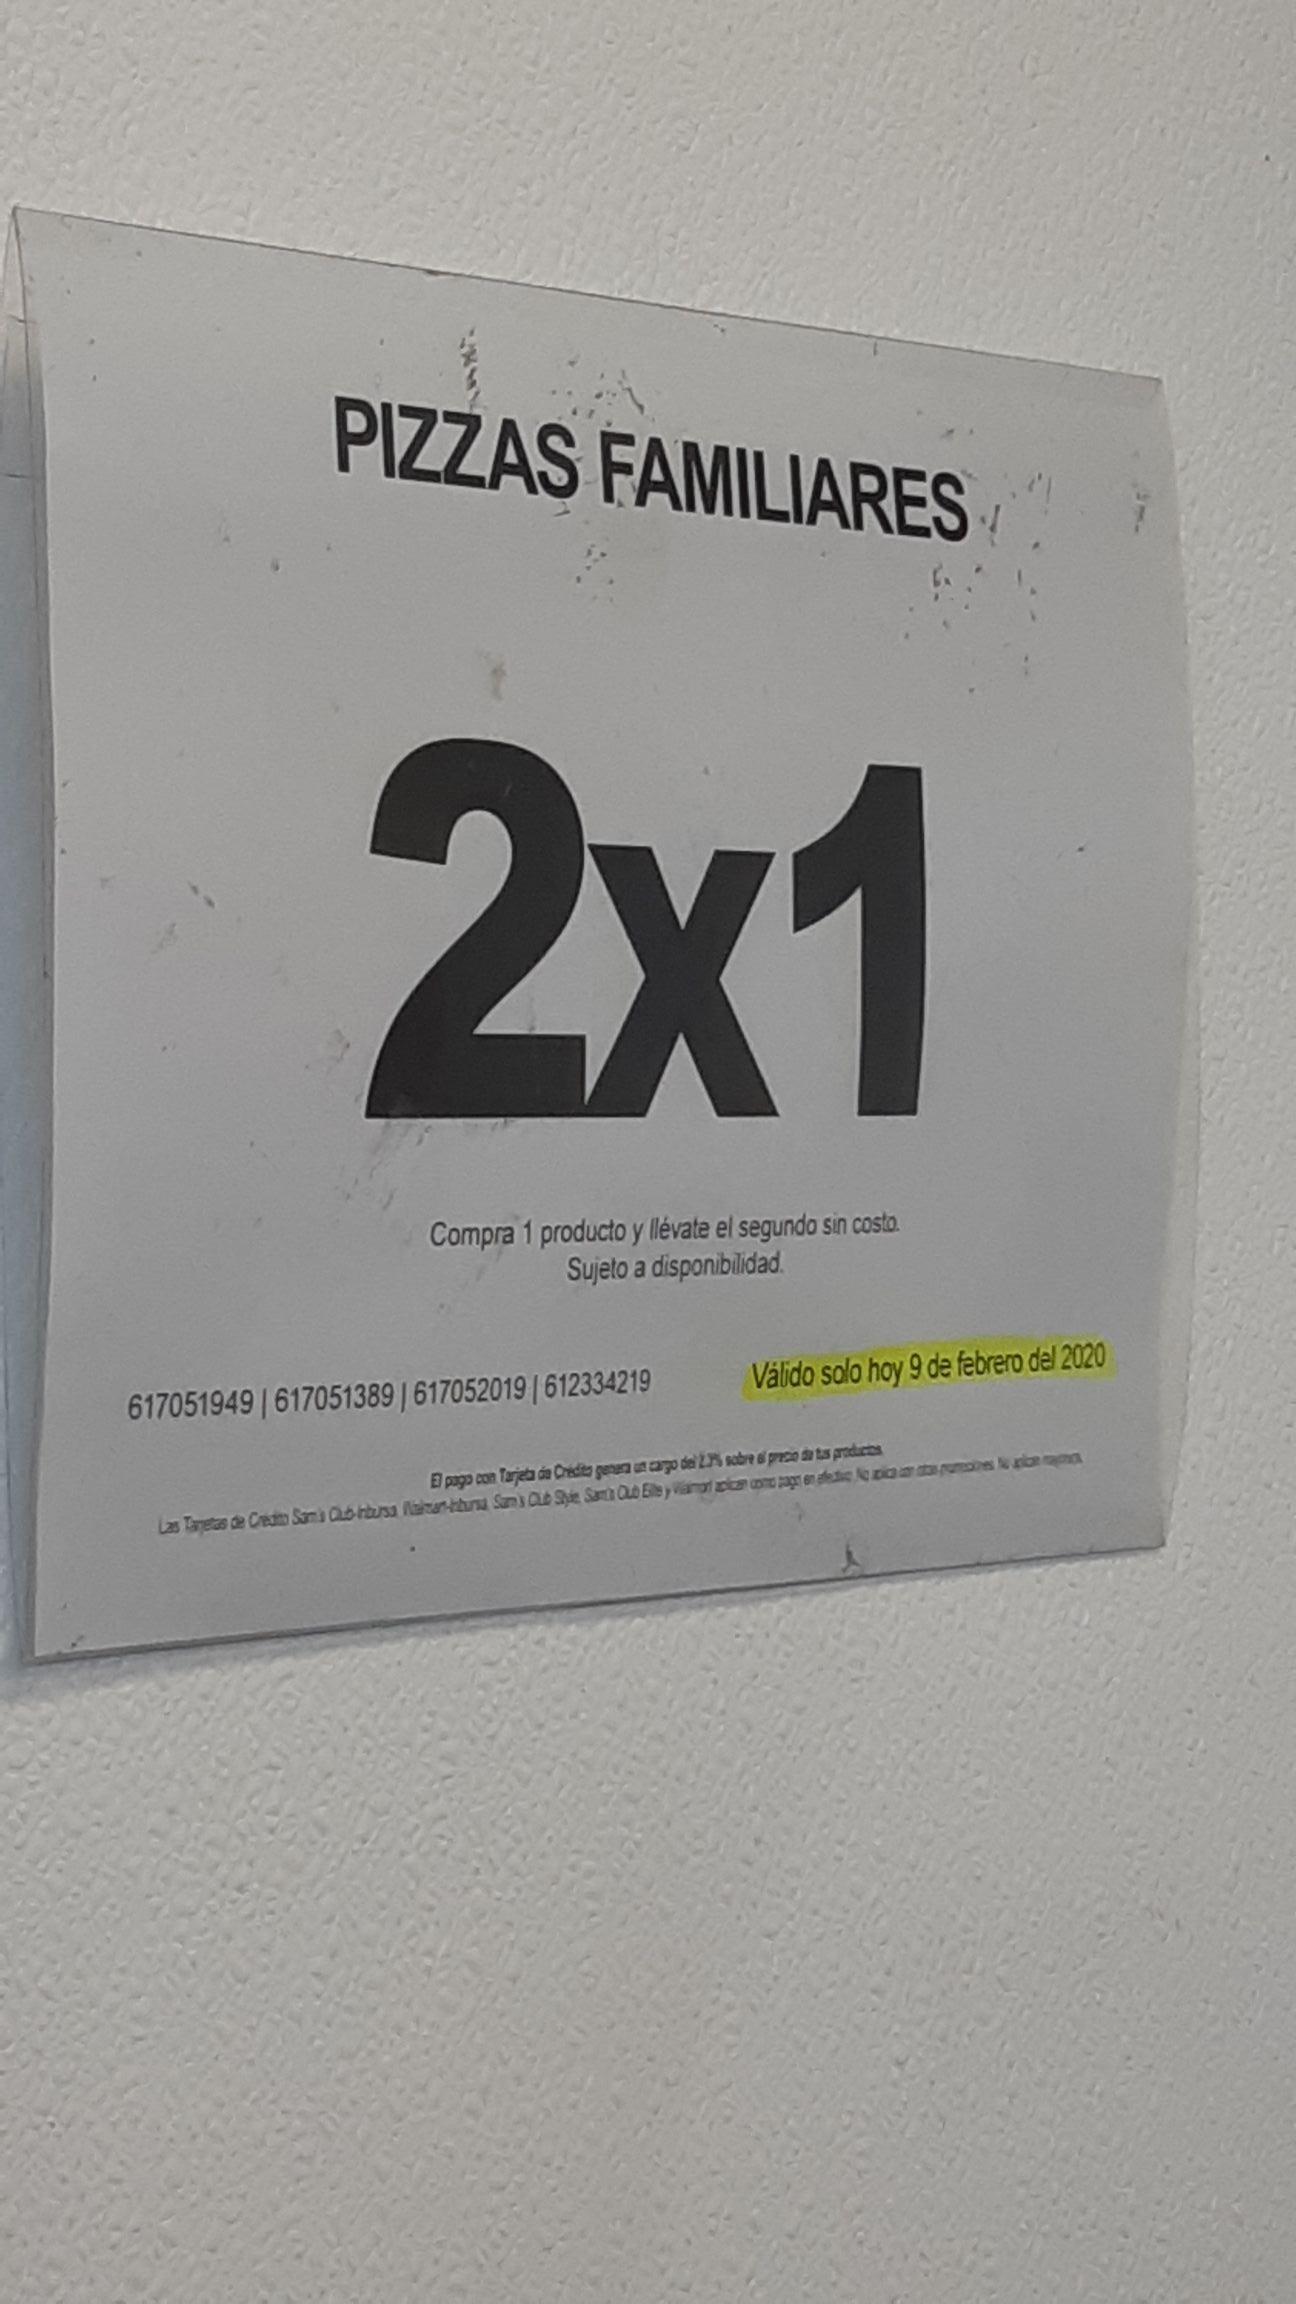 Sam's Club: Pizzas al 2x1